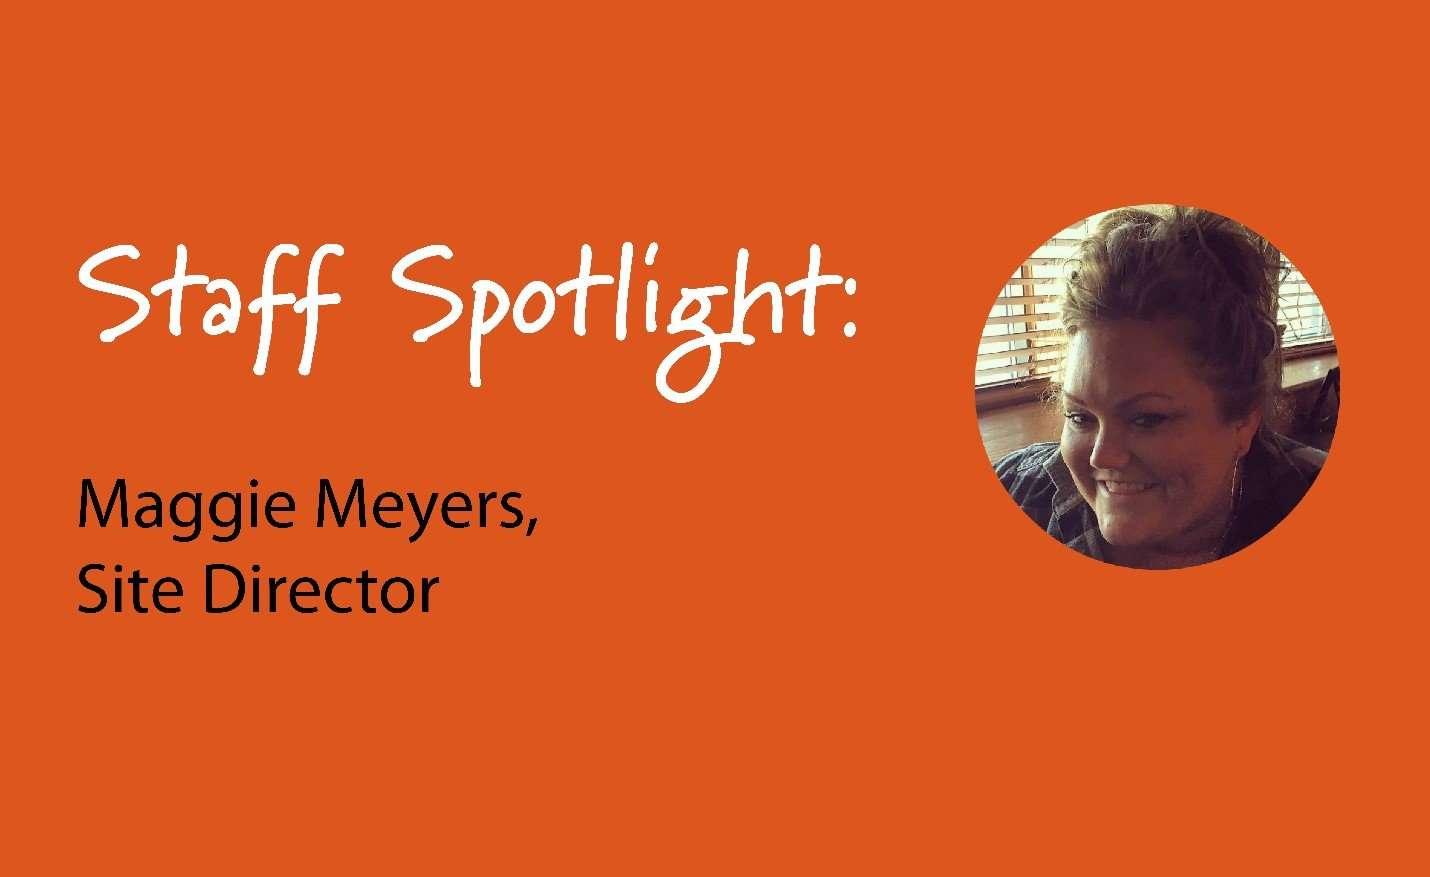 staff spotlight Maggie Meyers